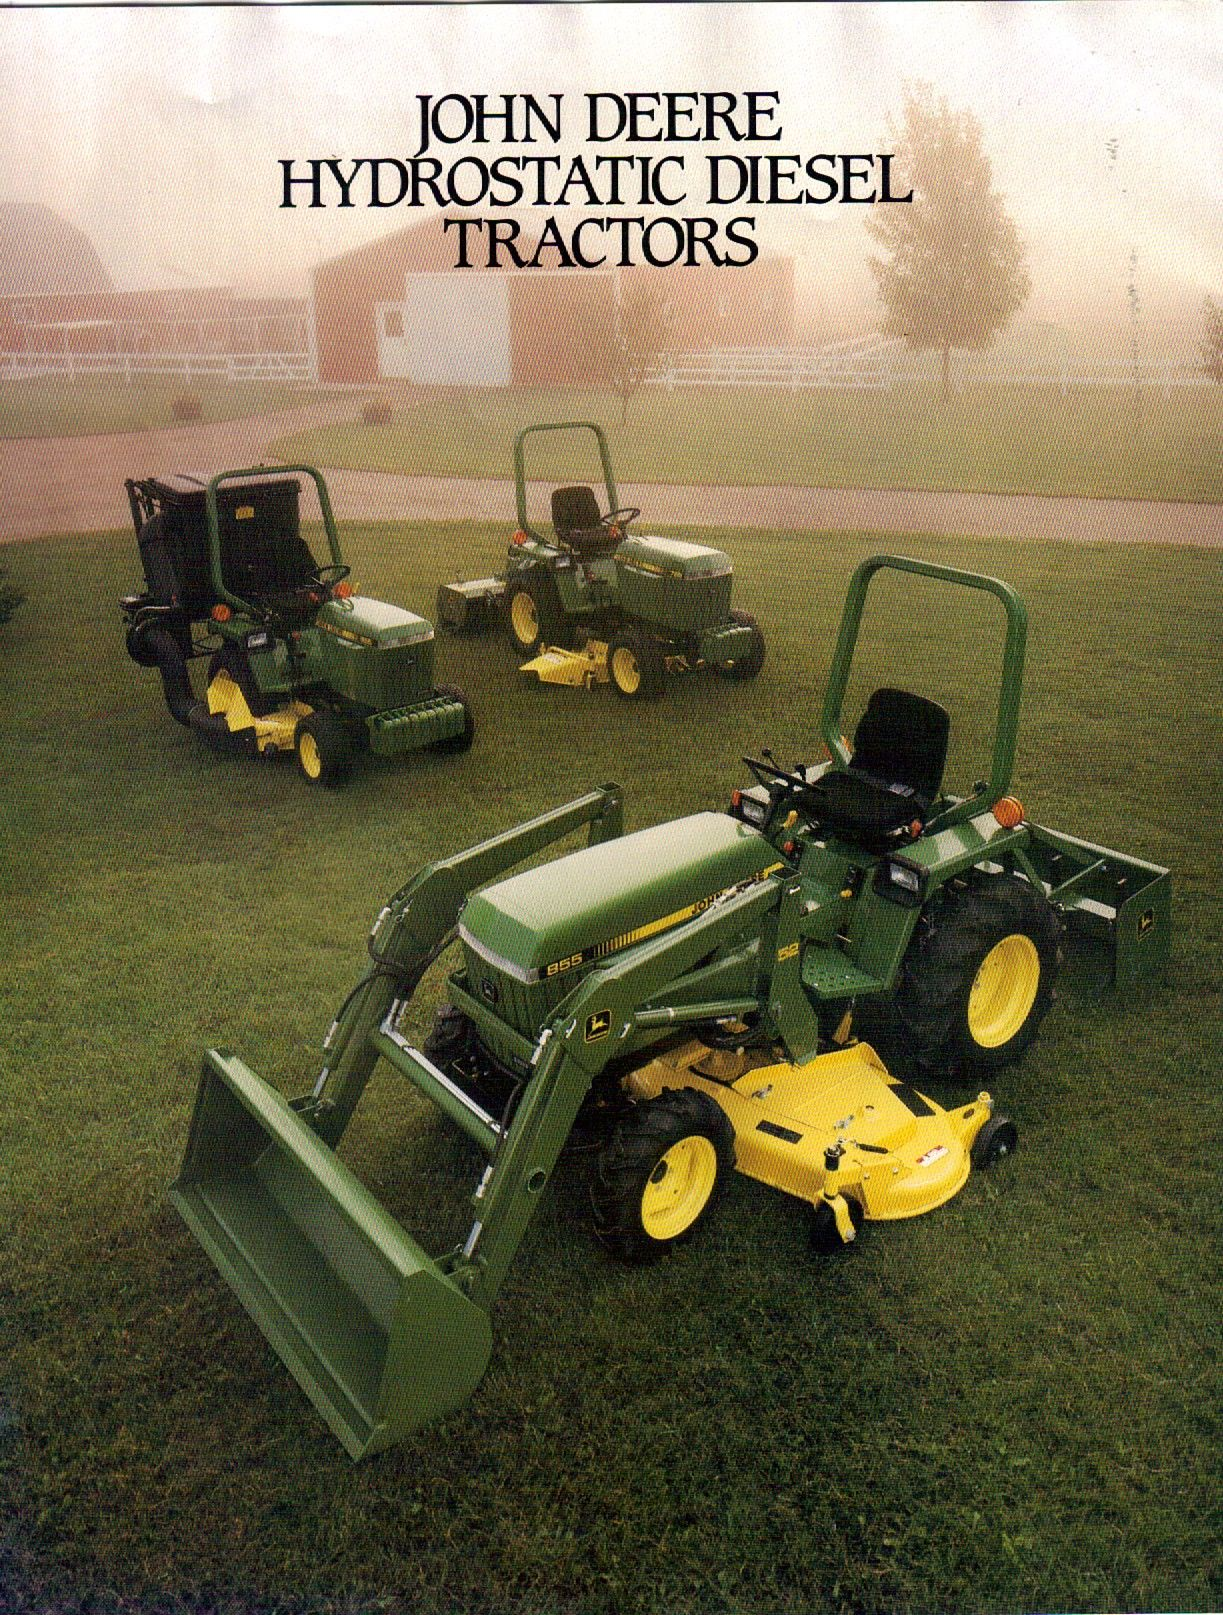 John Deere 655-755-855 Compact Diesel Tractor Brochure, these